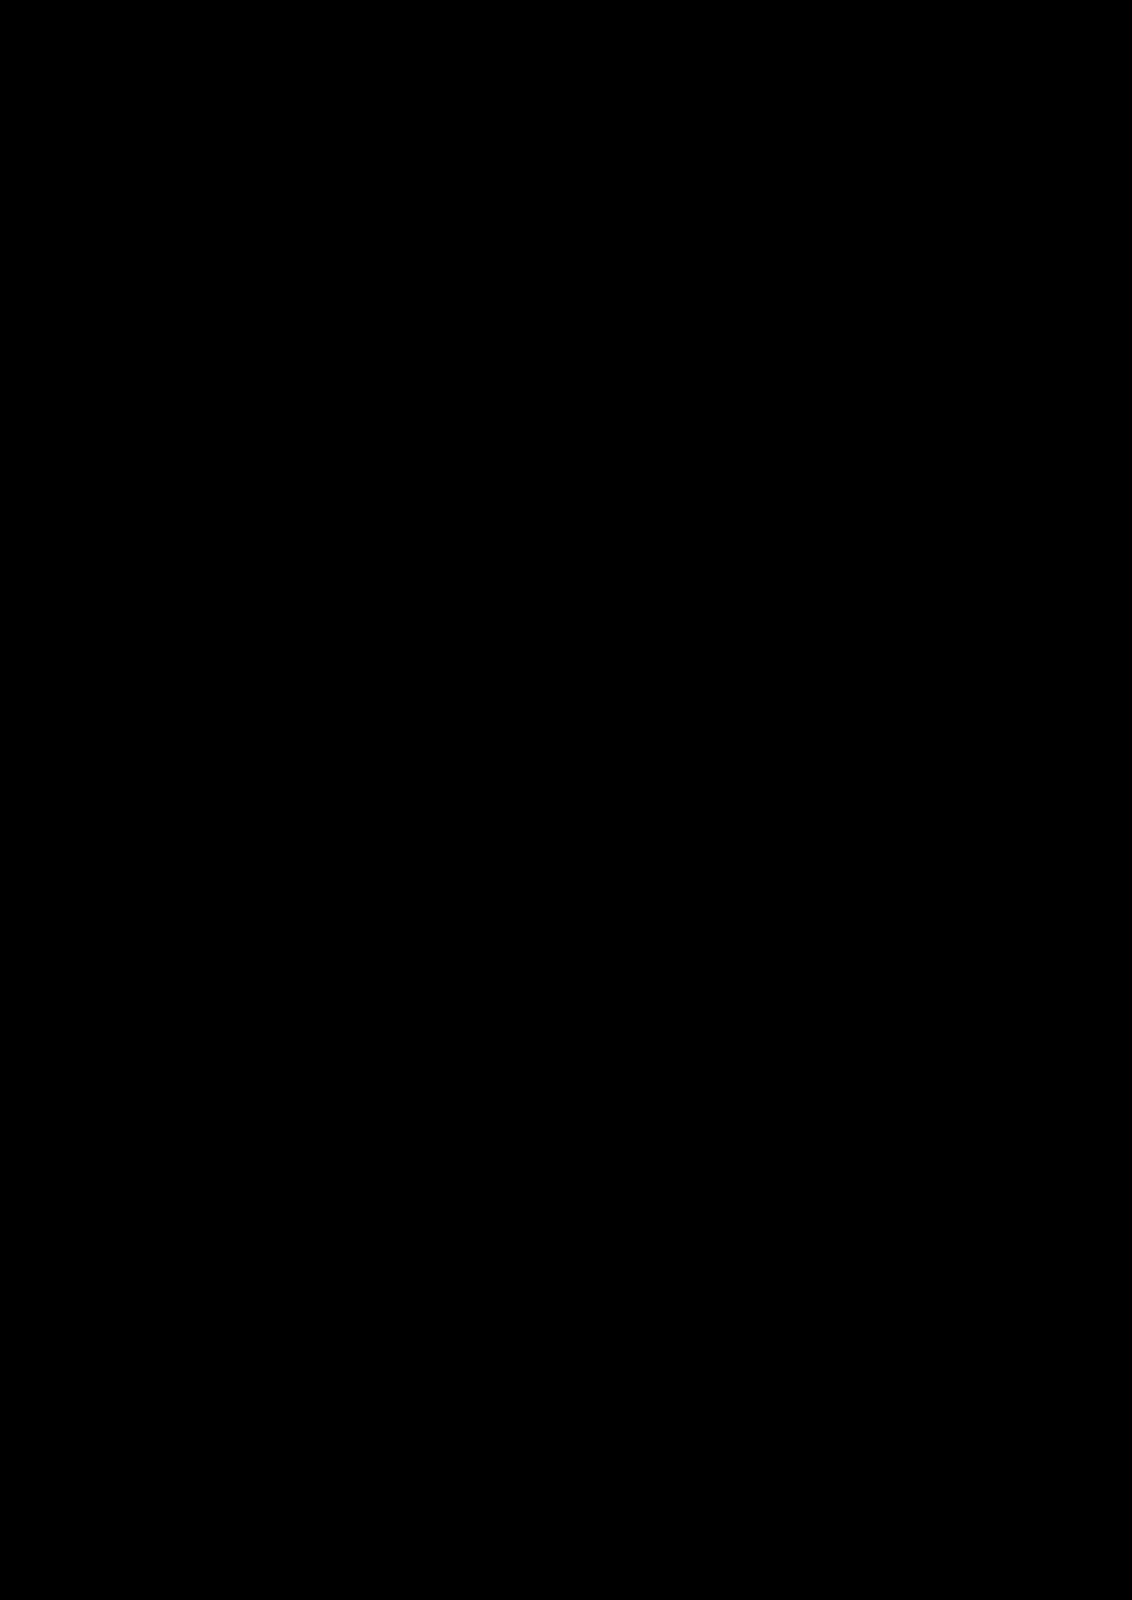 skarga - wydruk komputerowy